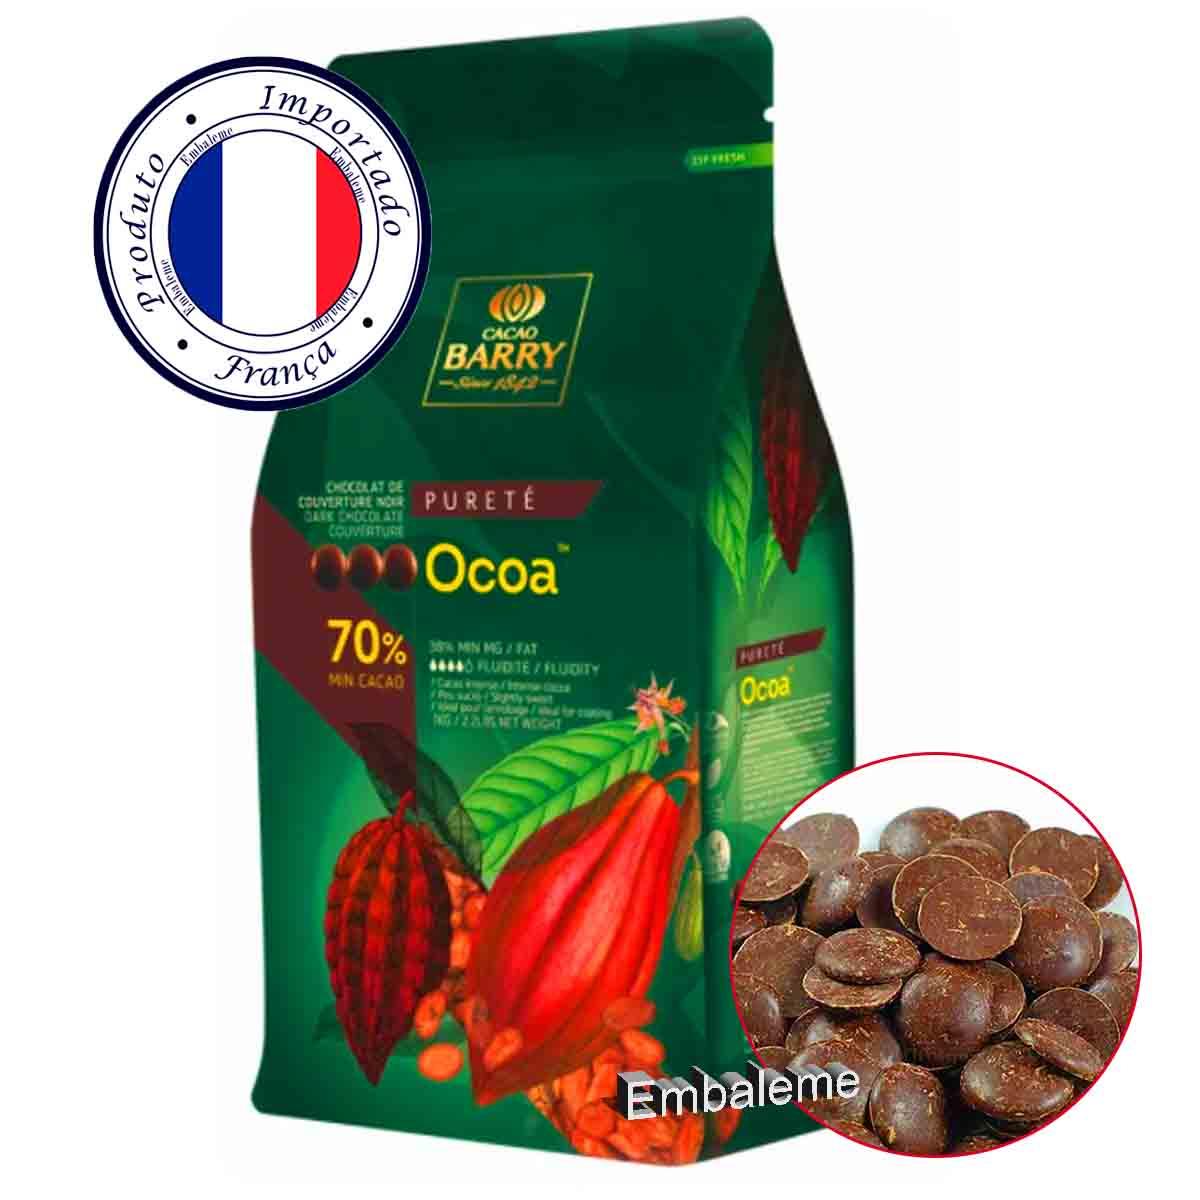 Chocolate Callebaut Amargo Ocoa 70% Cacau Gotas 1kg BARRY CALLEBAUT